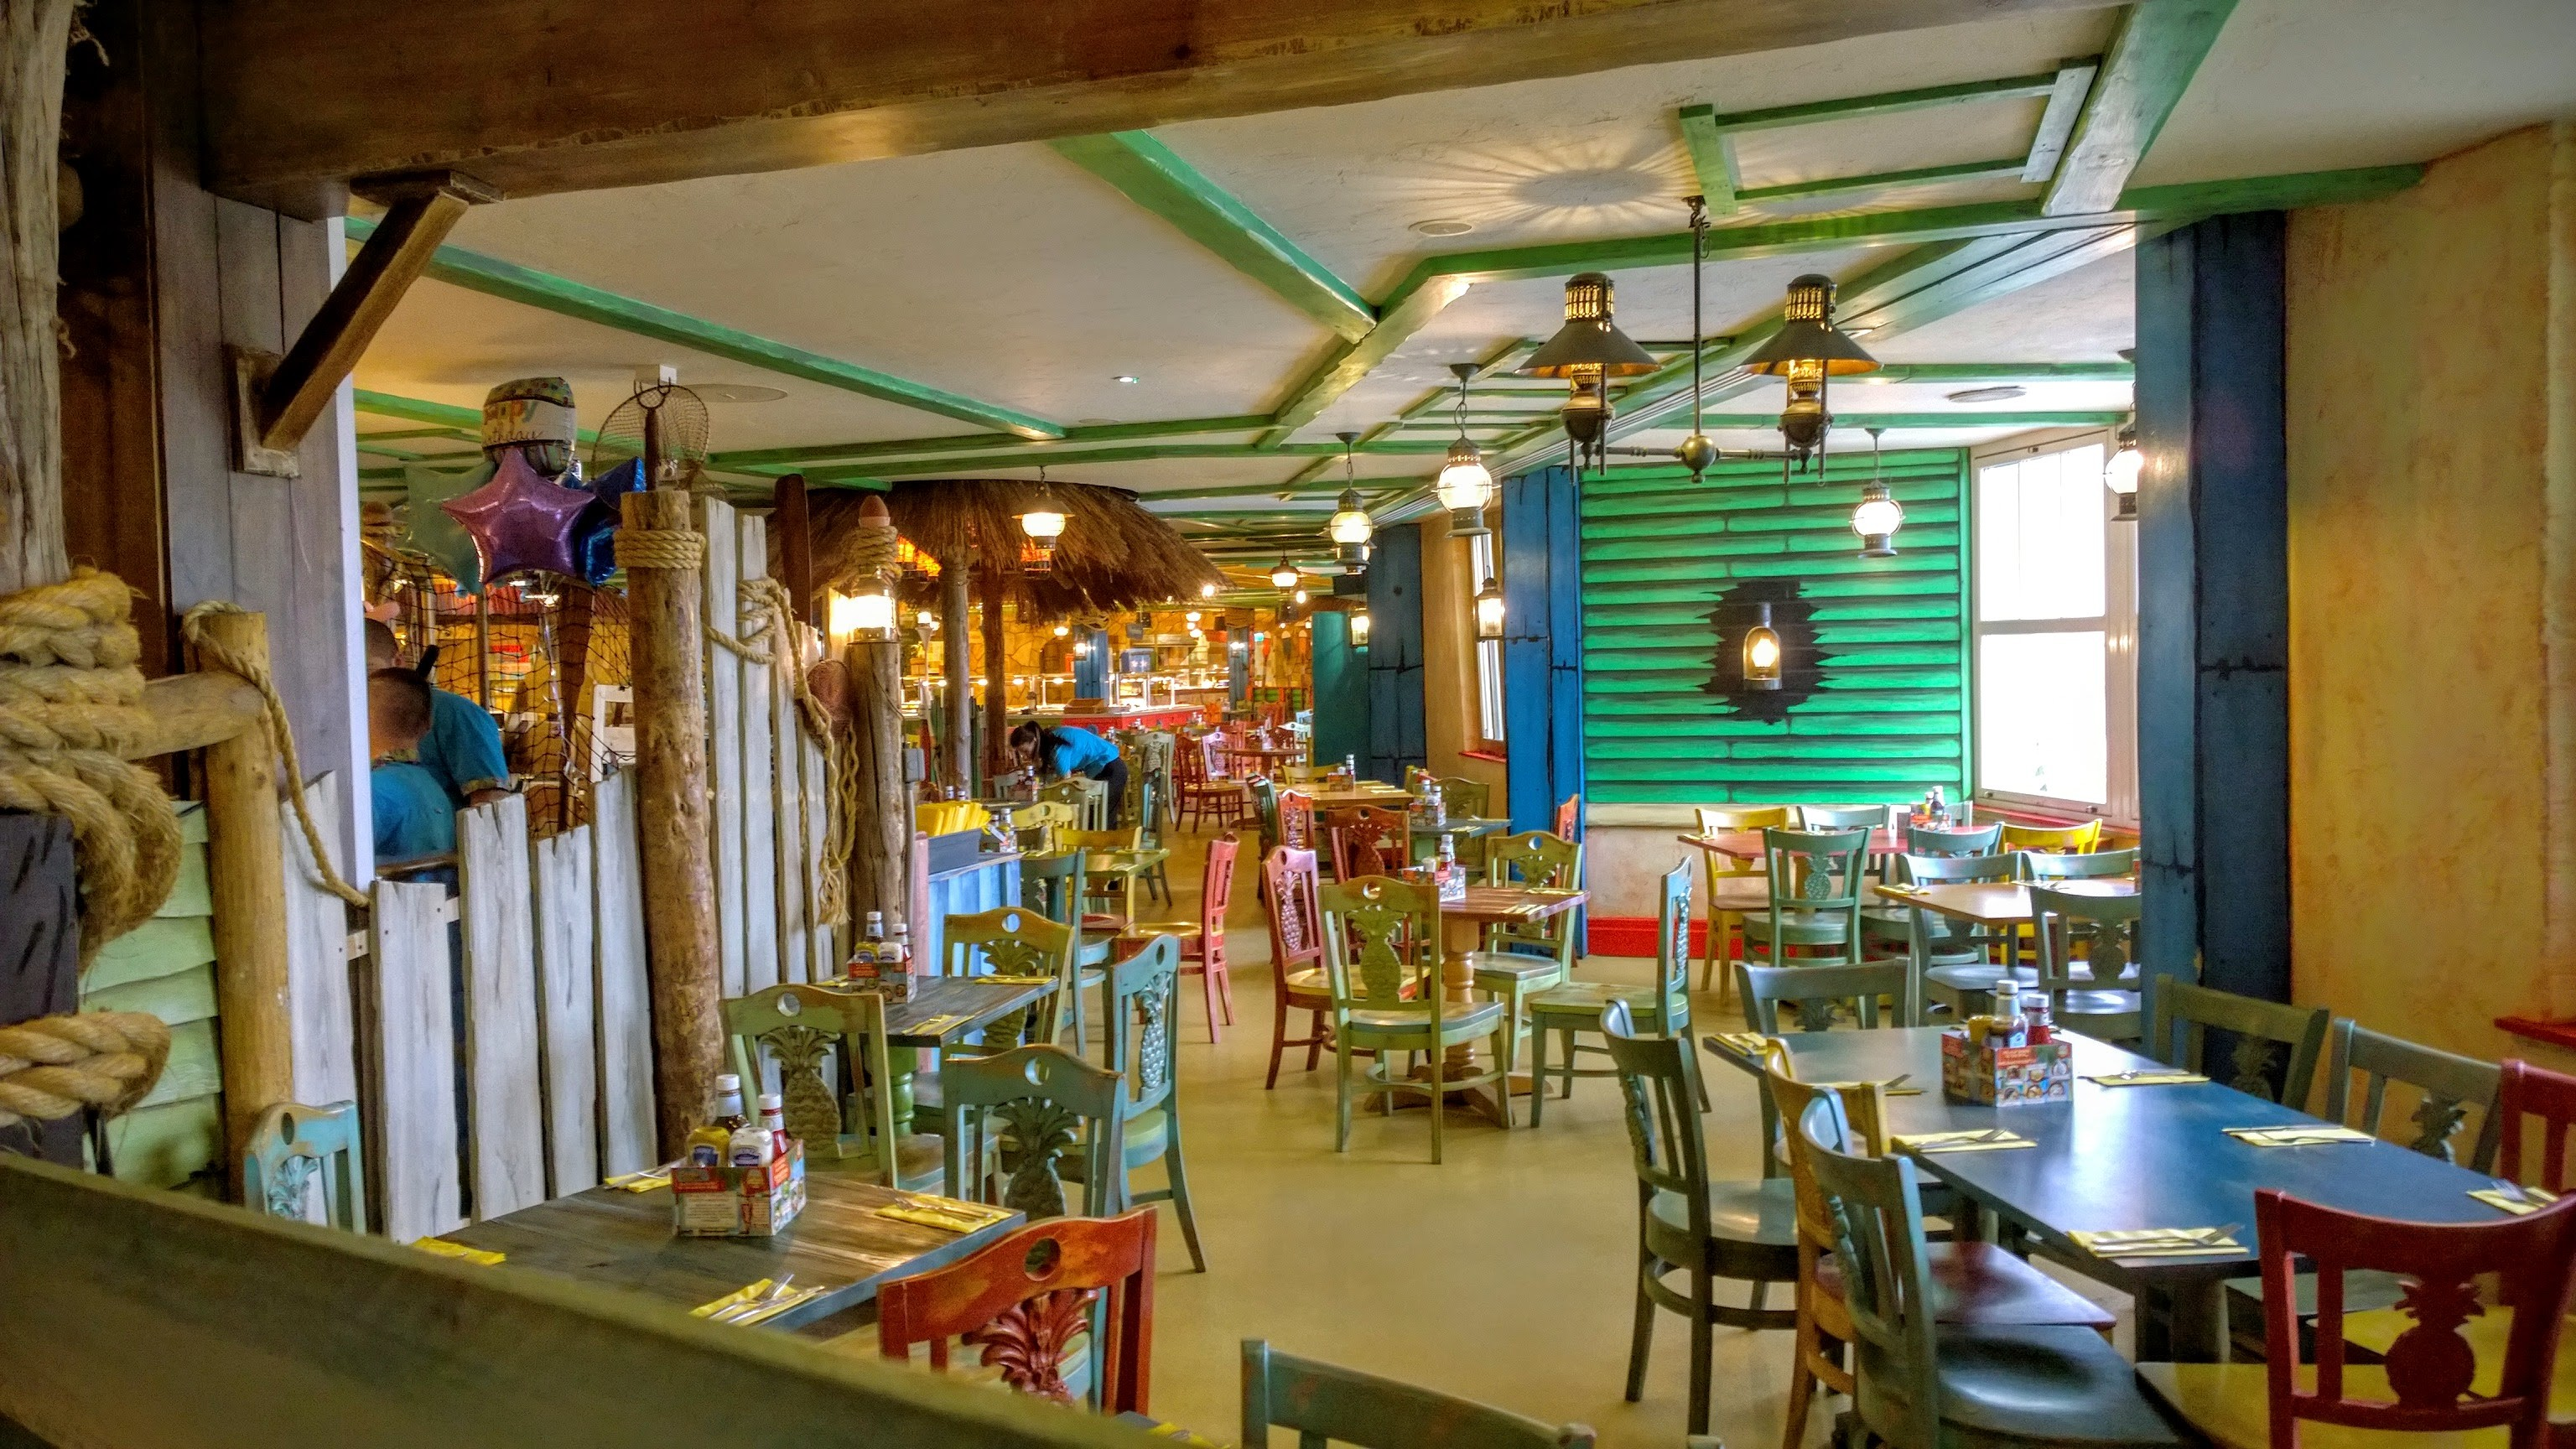 Alton towers resort hotel bargains flambos exotic feast in splash landings hotel